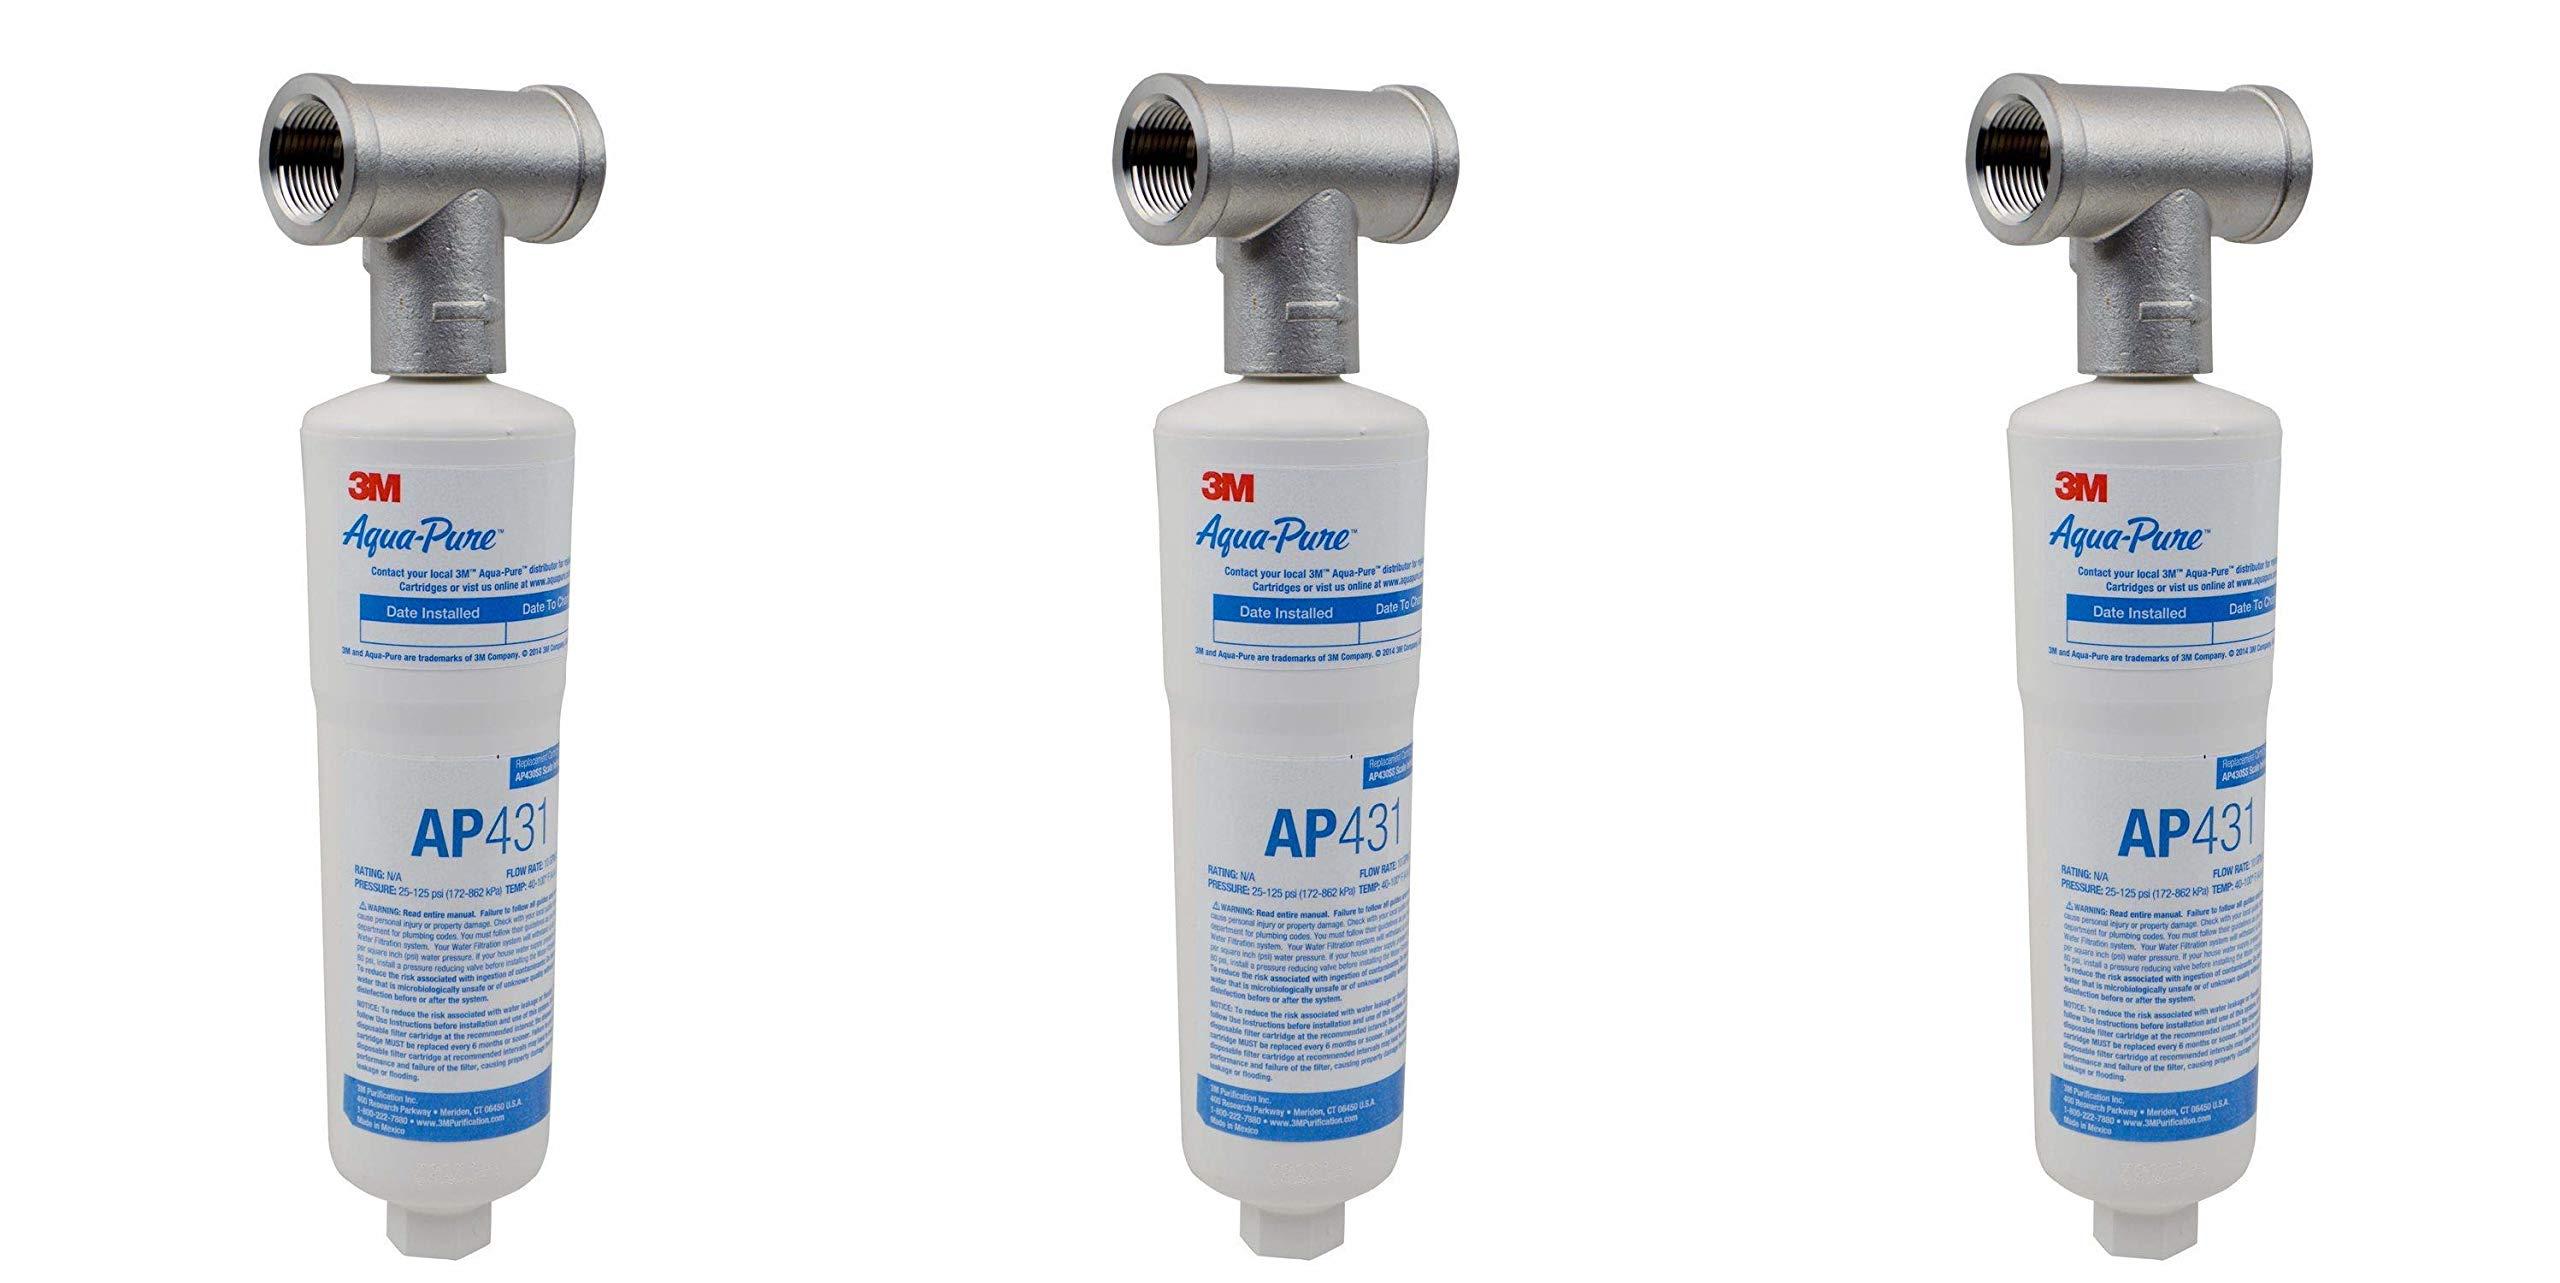 Aqua-Pure AP430SS Hot Water System Protector (3 Pack) by AquaPure